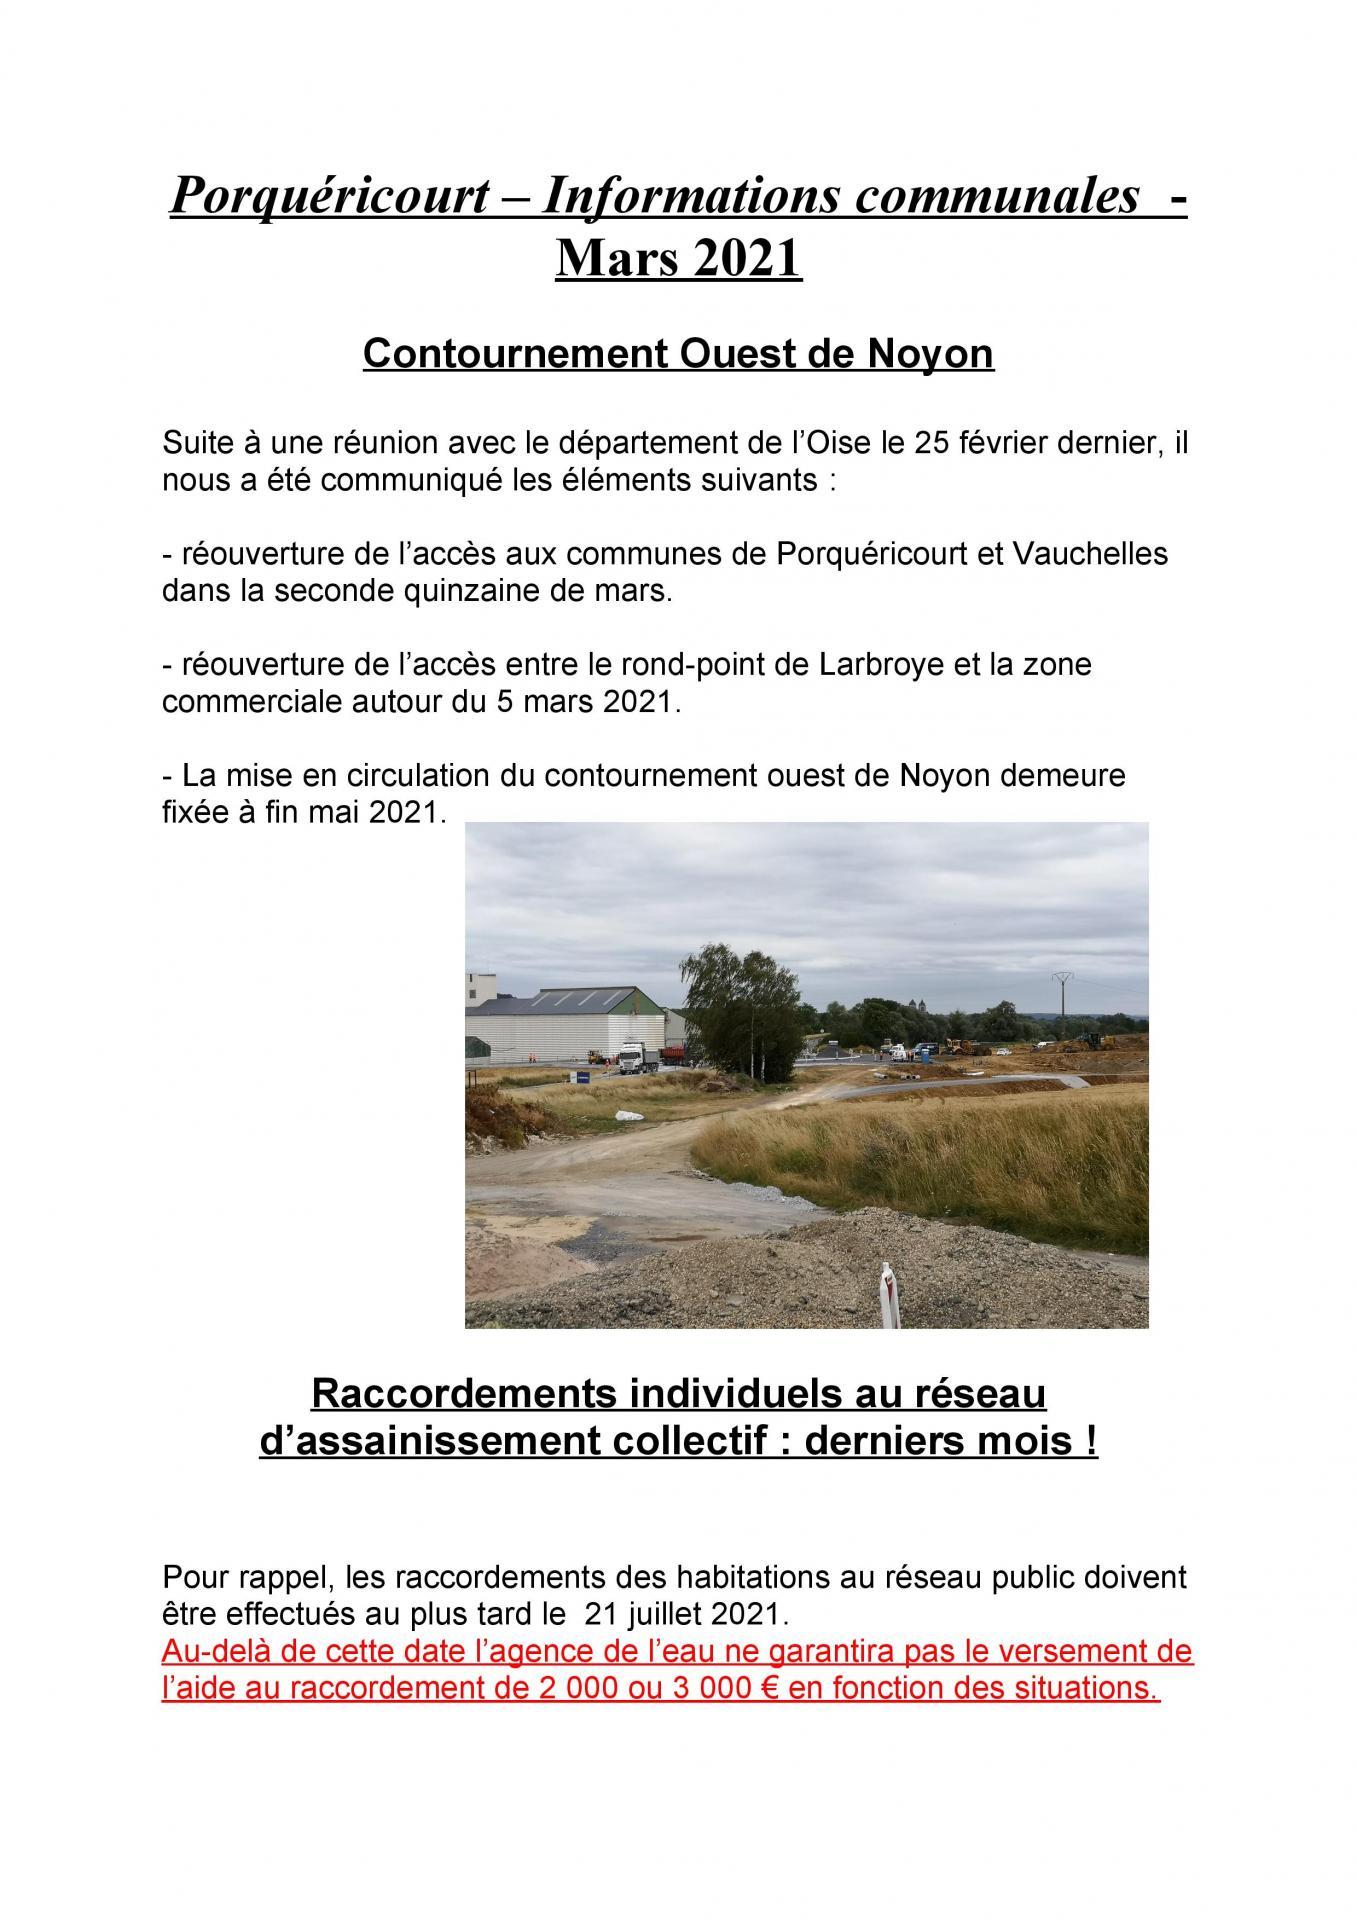 Porquericourt infos mars 2021 page 001